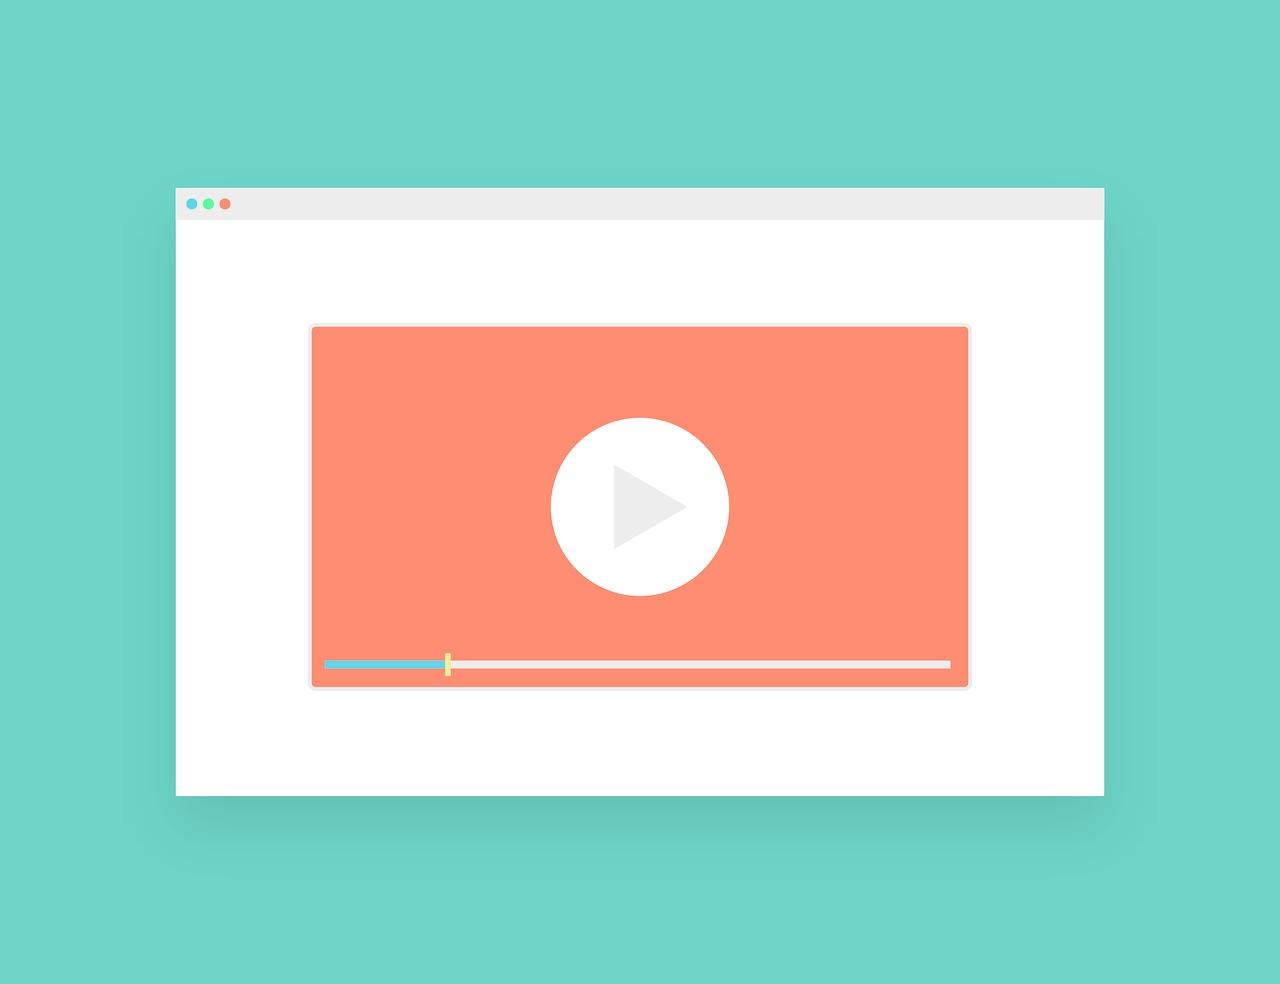 Errores de video marketing en Instagram que debes evitar